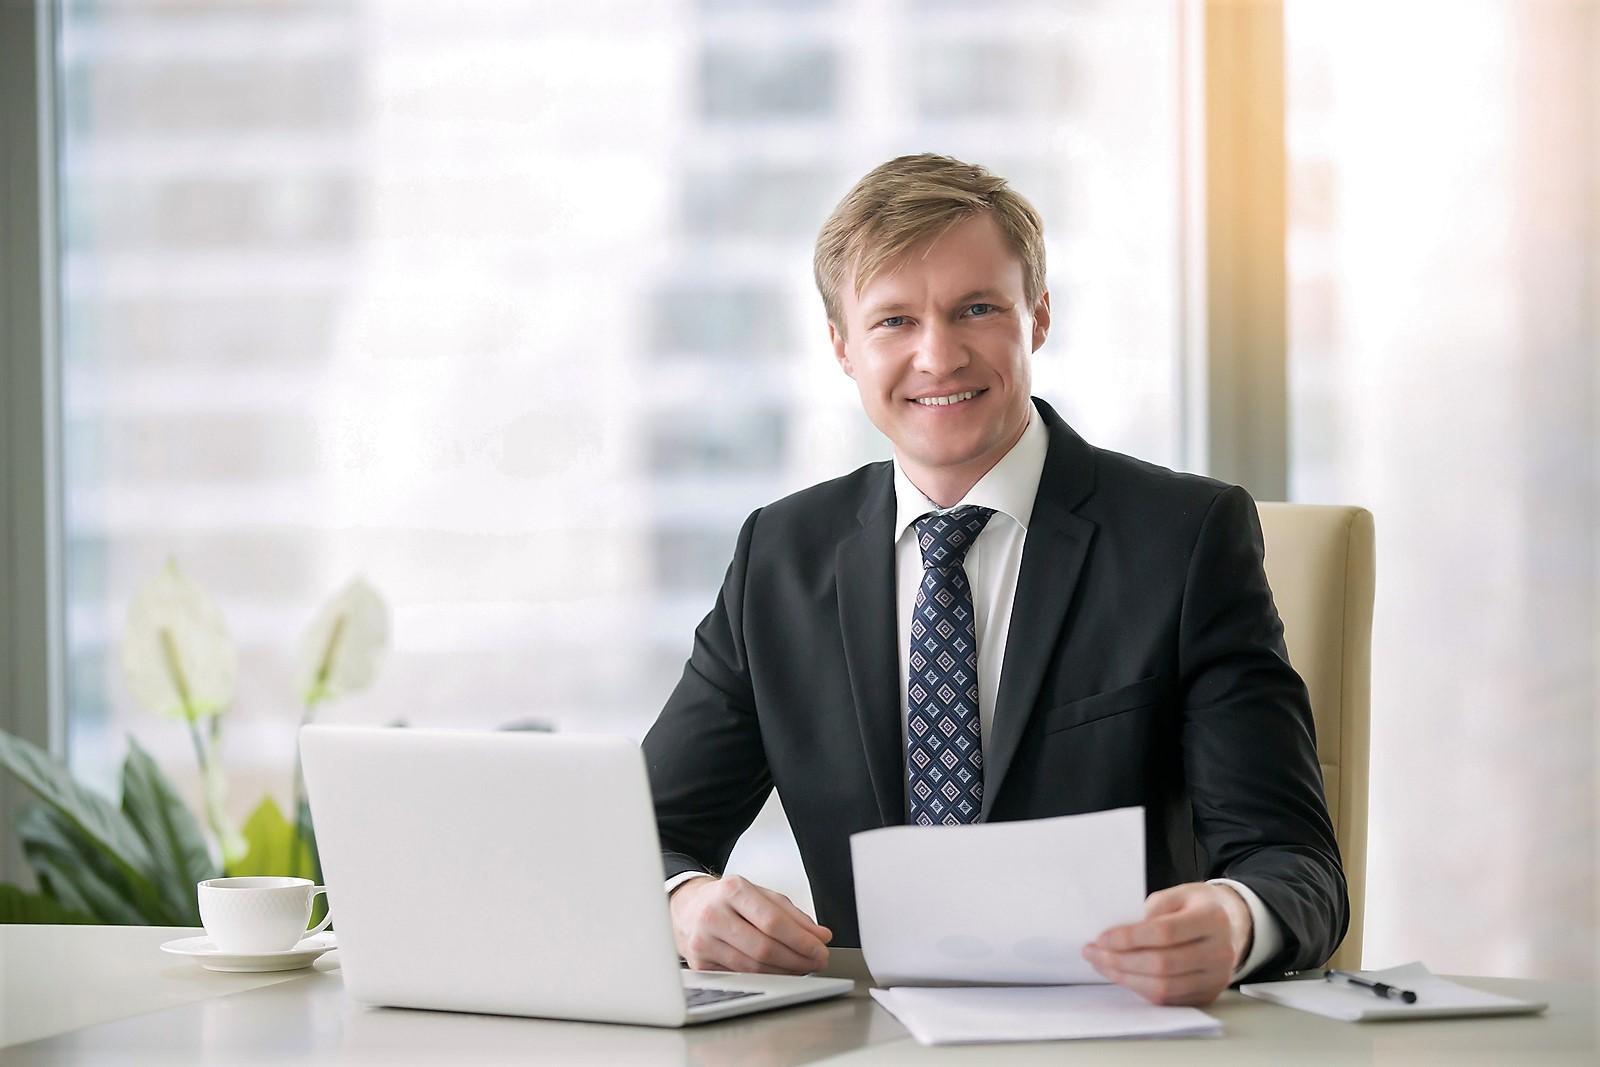 resume screening checklist